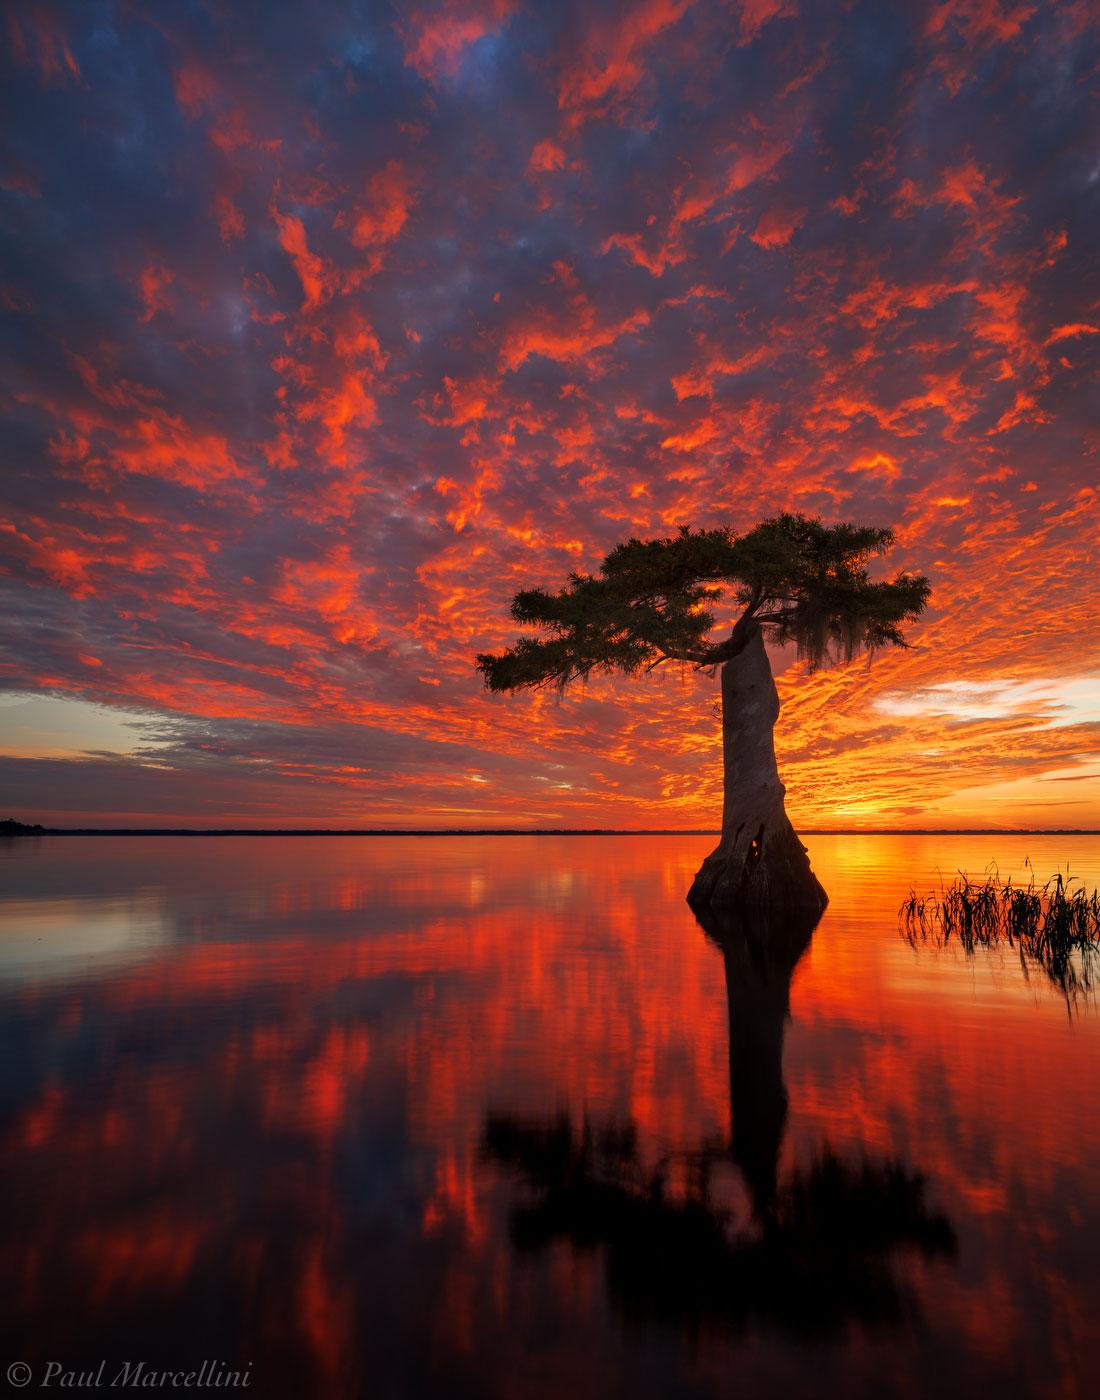 cypress, Blue Cypress Lake, Indian River County, FL, sunrise, florida, south florida, nature, photography, photo